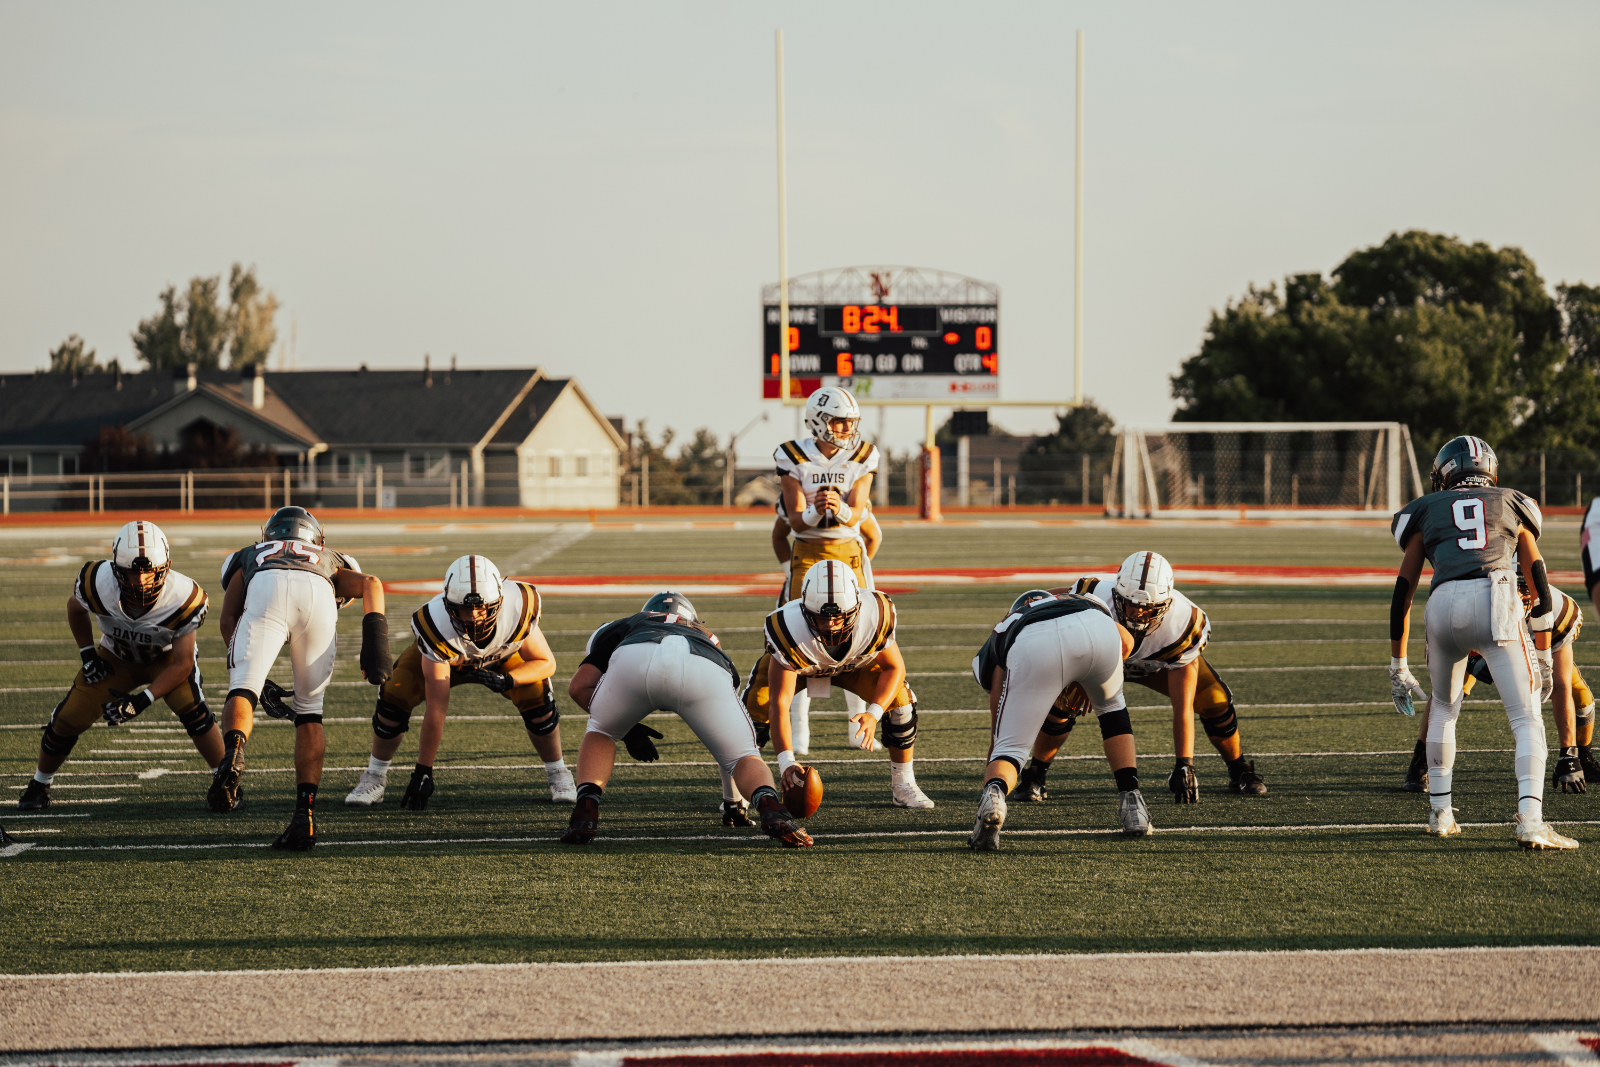 Davis Football @ Northridge 8.28.20 – Gallery 1